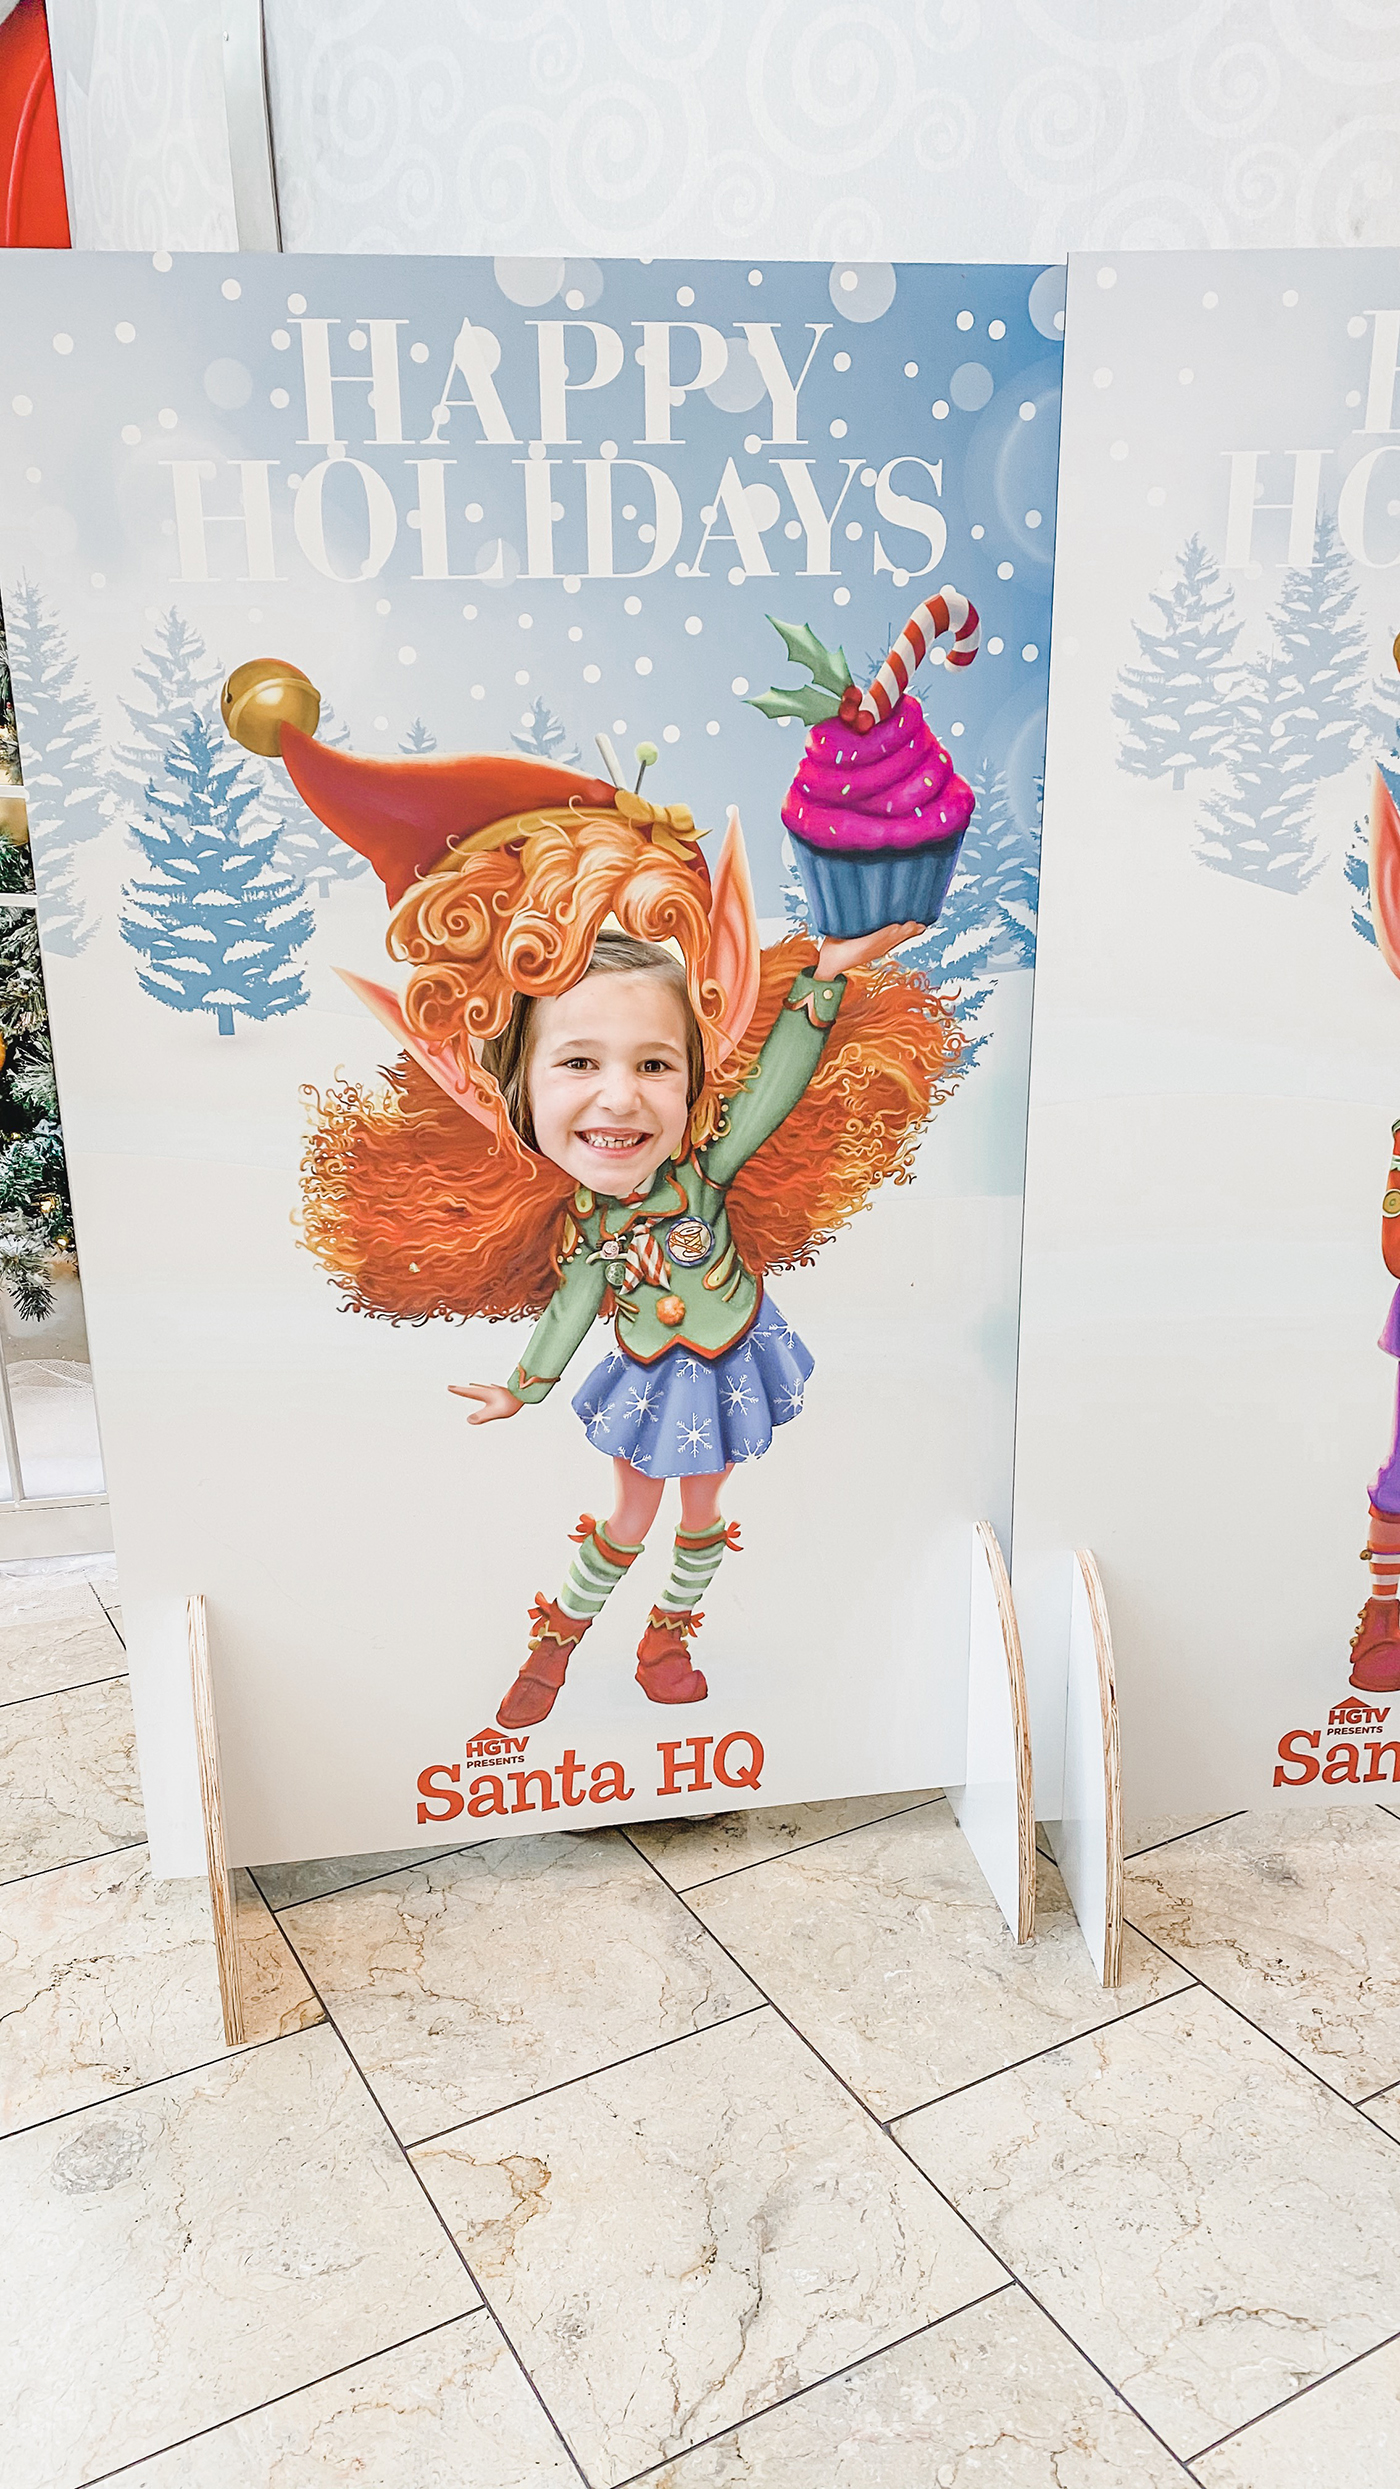 Little girl posting in head cutout of elf body